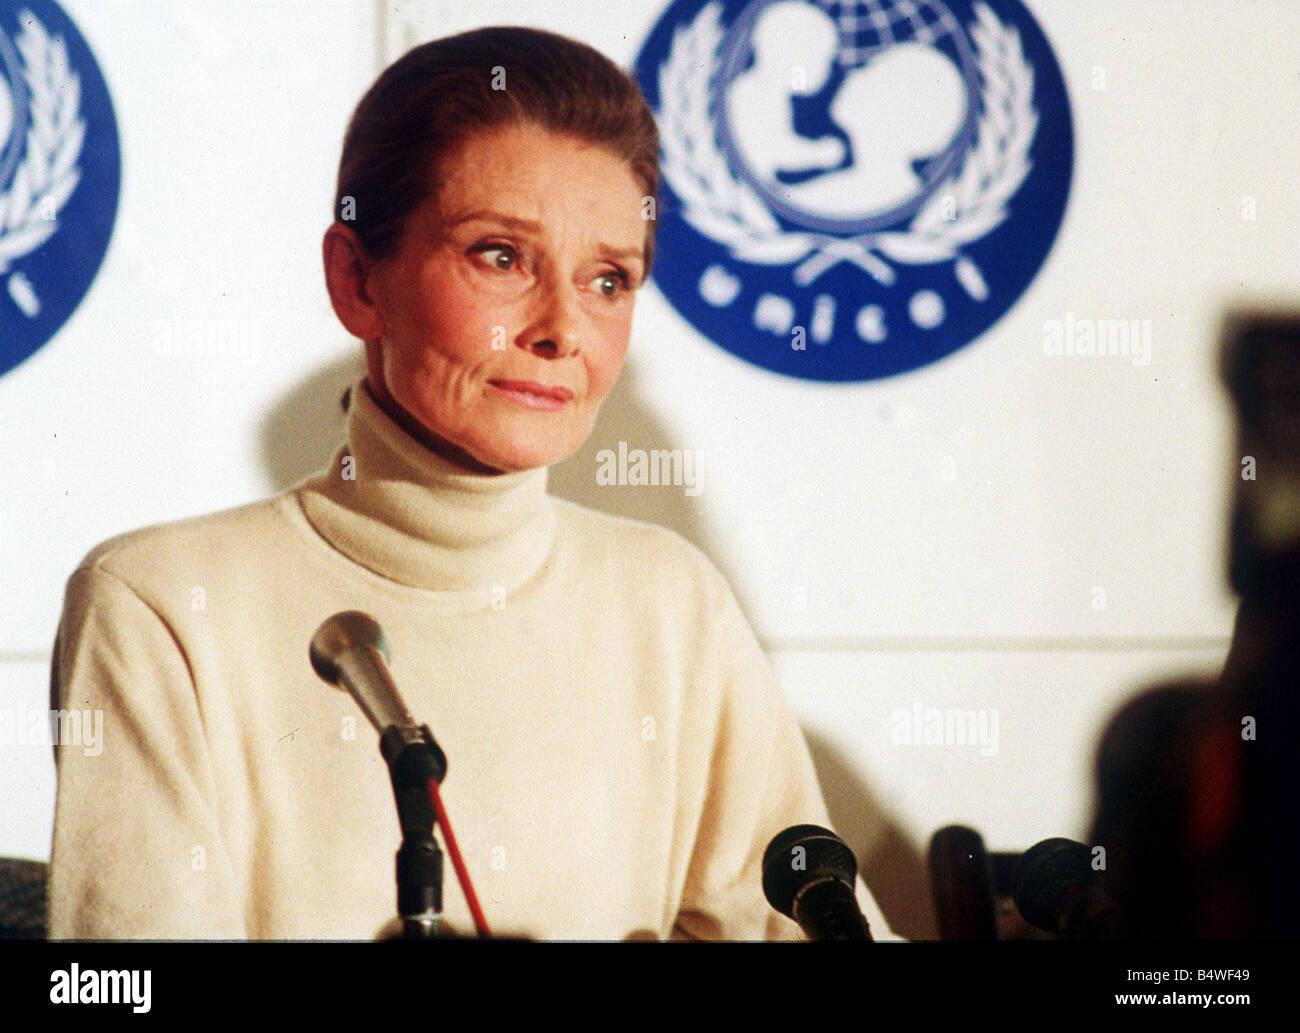 Audrey Hepburn actress speaking at UNICEF Stock Photo